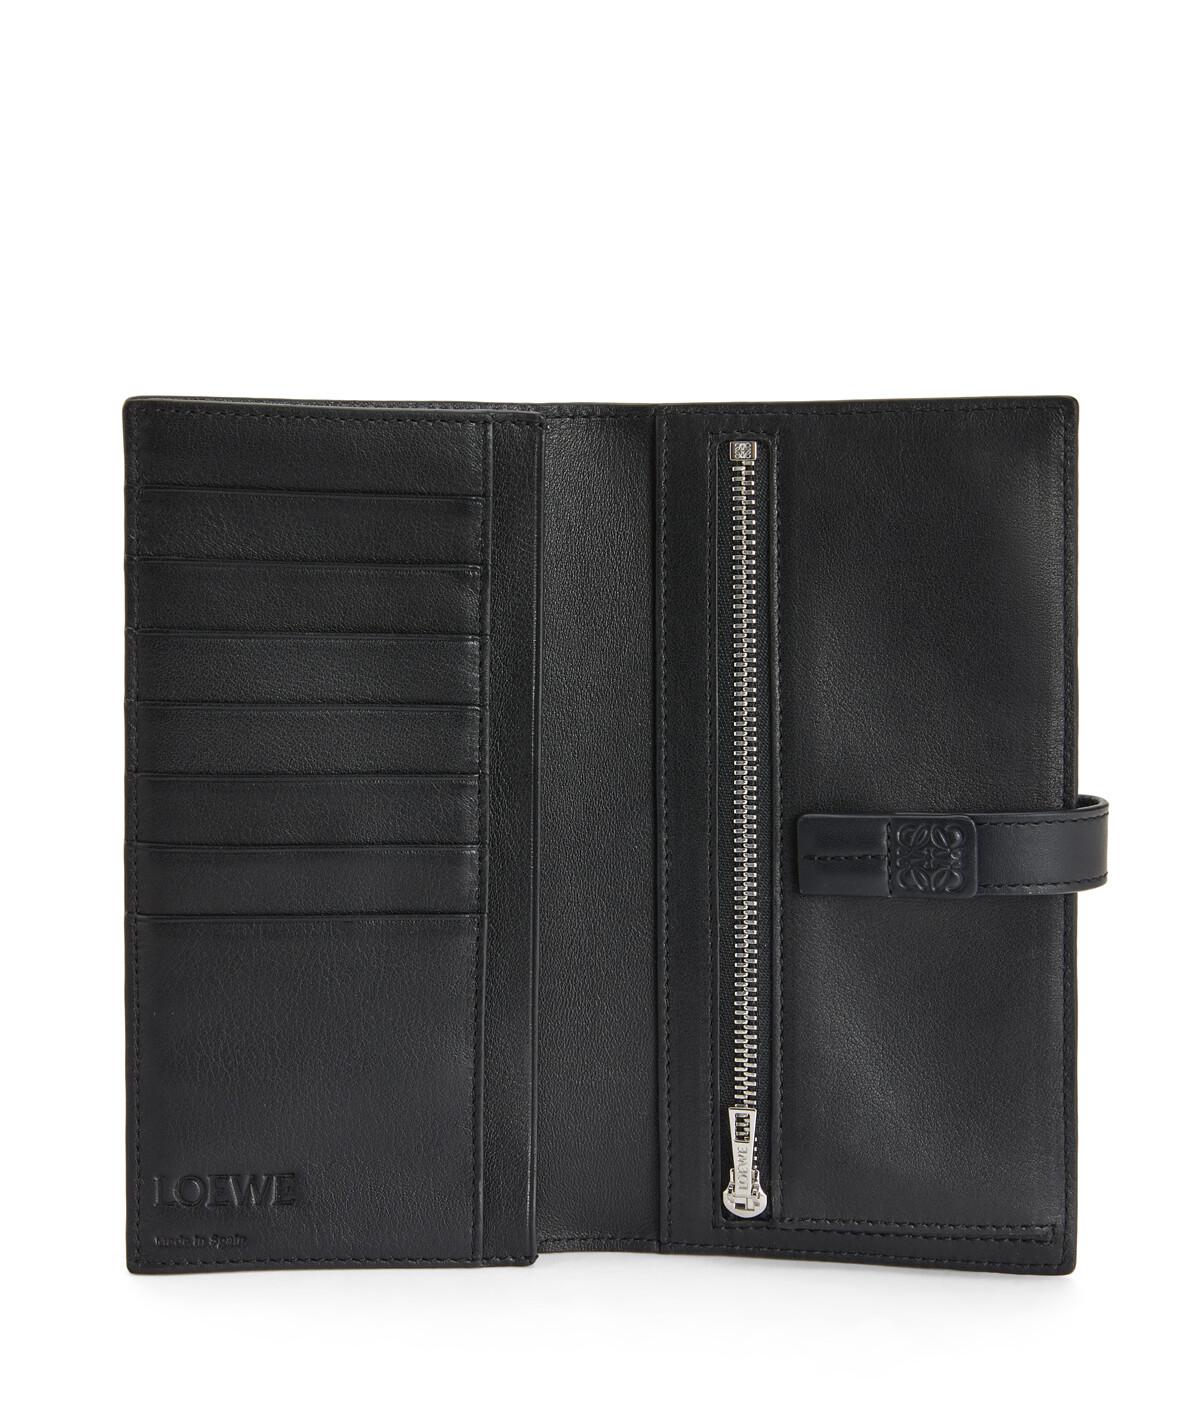 LOEWE Large Vertical Wallet Black front